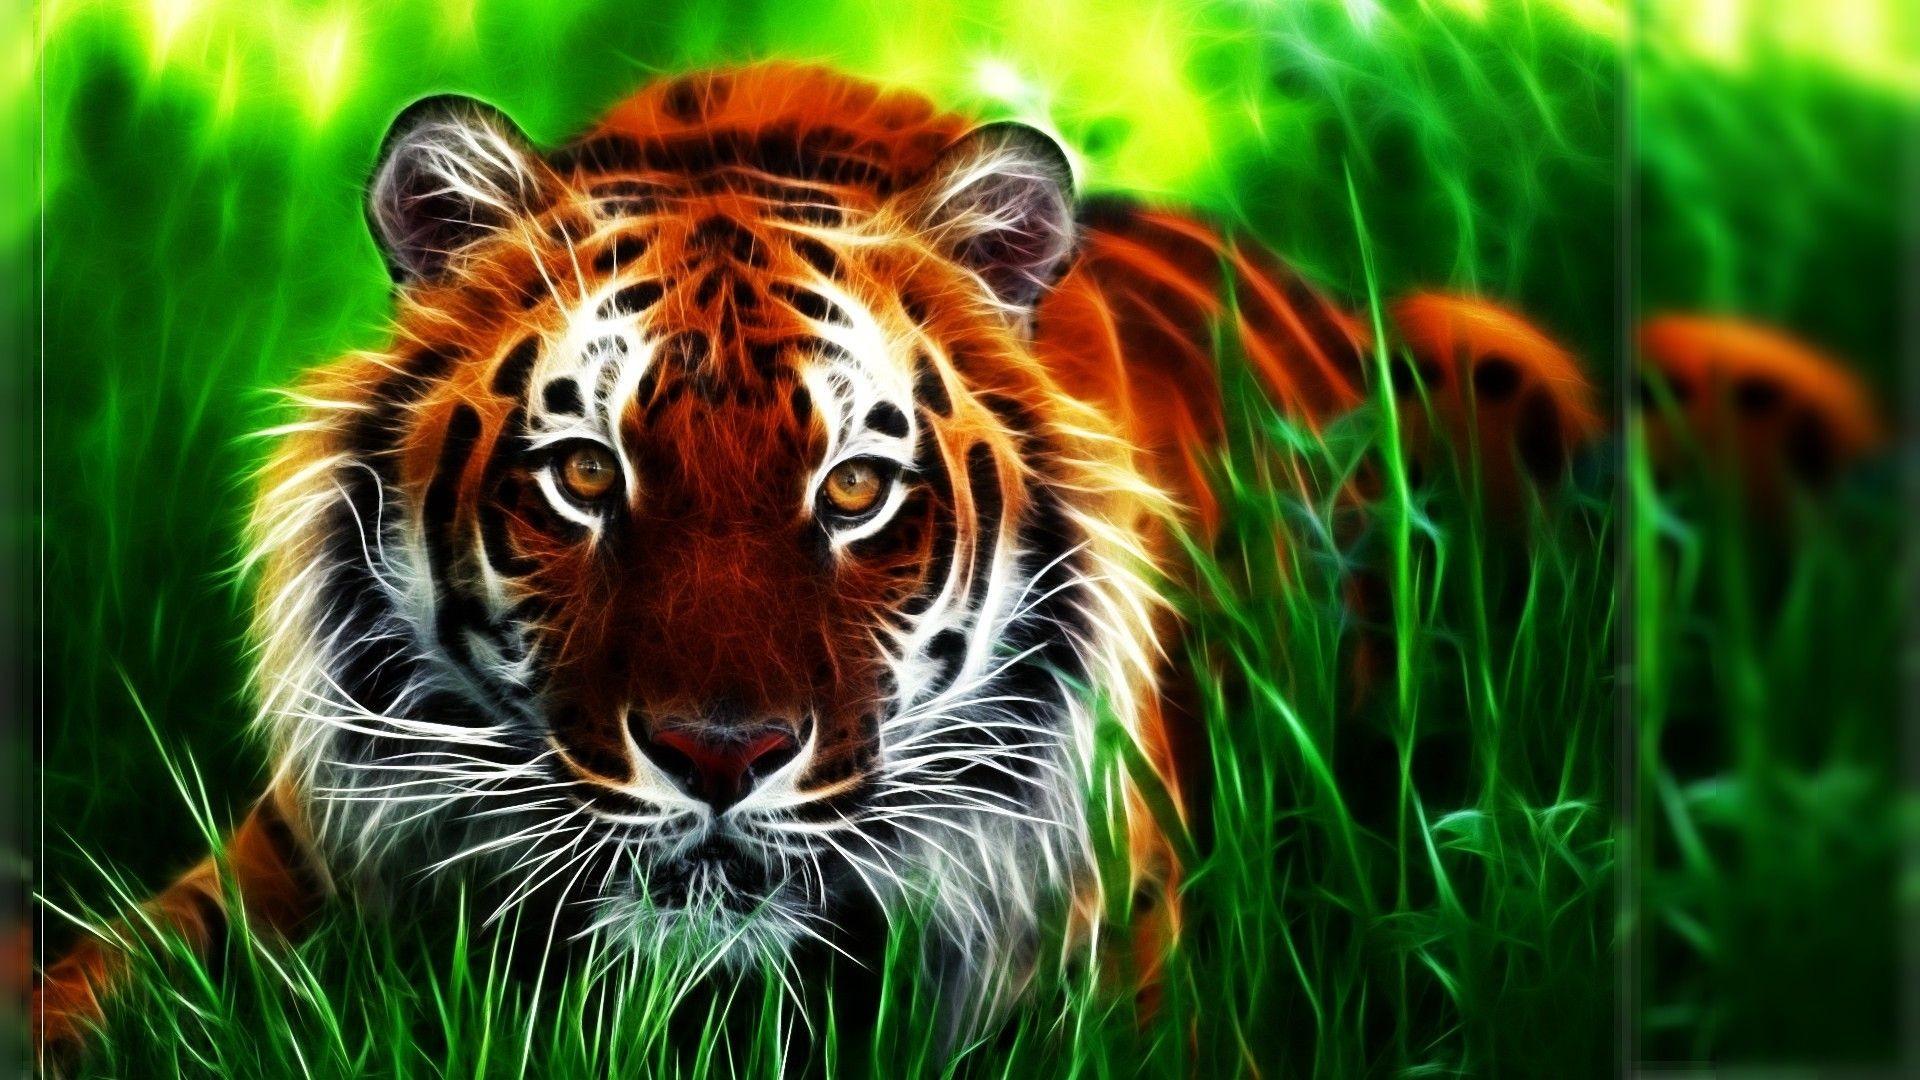 D Tiger Photoshop fractal wallpaper Green Tiger Wallpapers Wallpapers)